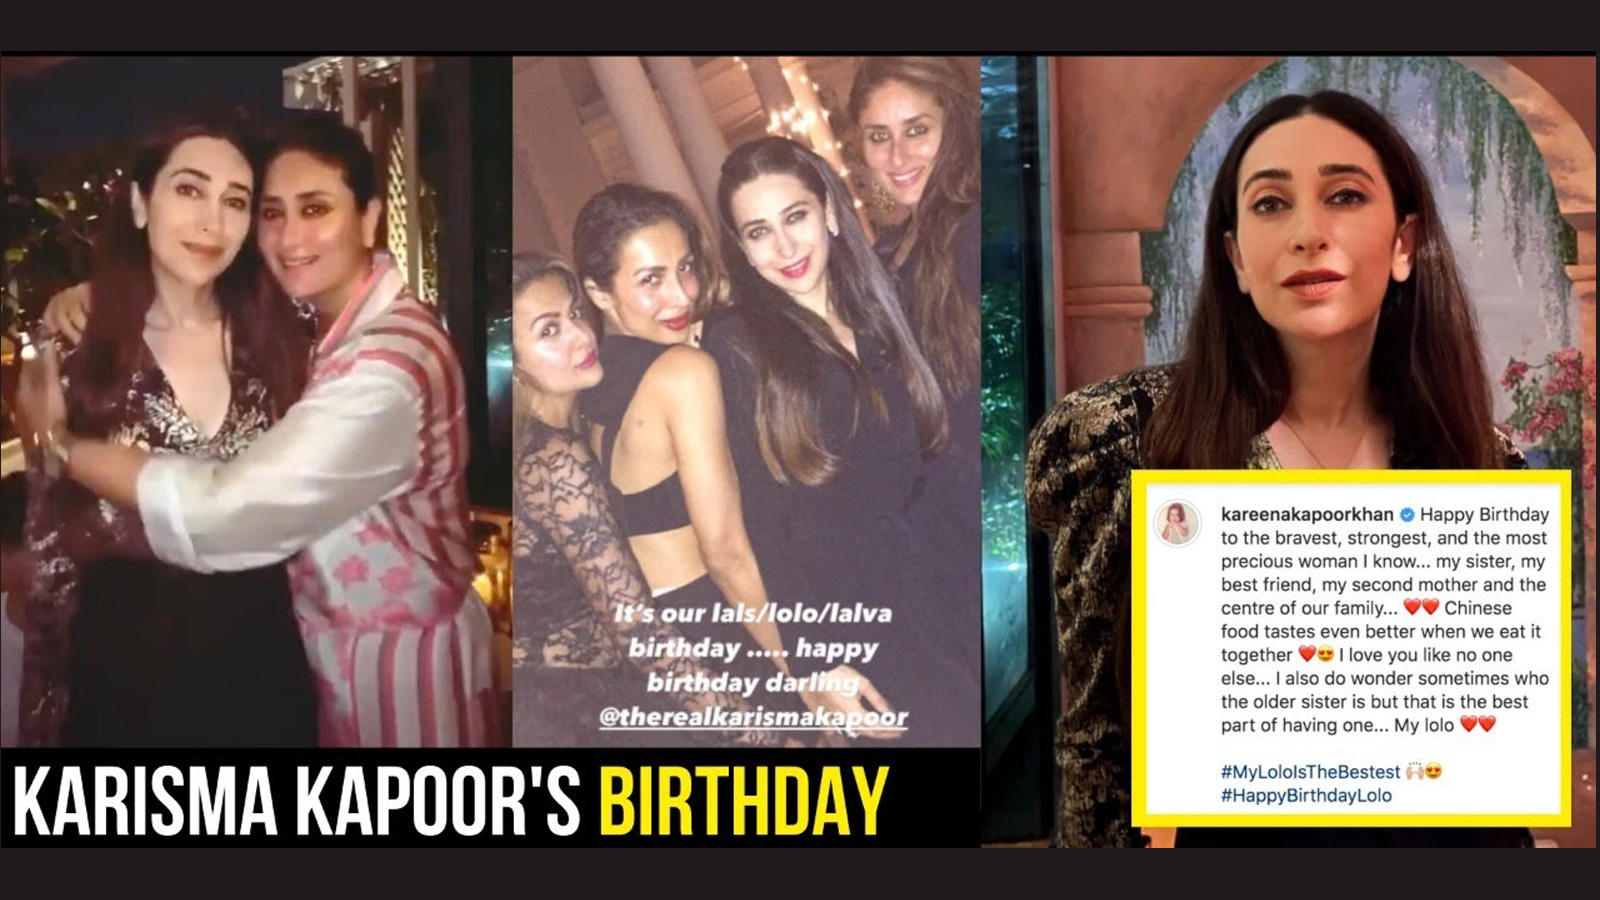 kareena-kapoor-shares-heartwarming-video-on-karisma-kapoors-birthday-malaika-arora-and-others-react